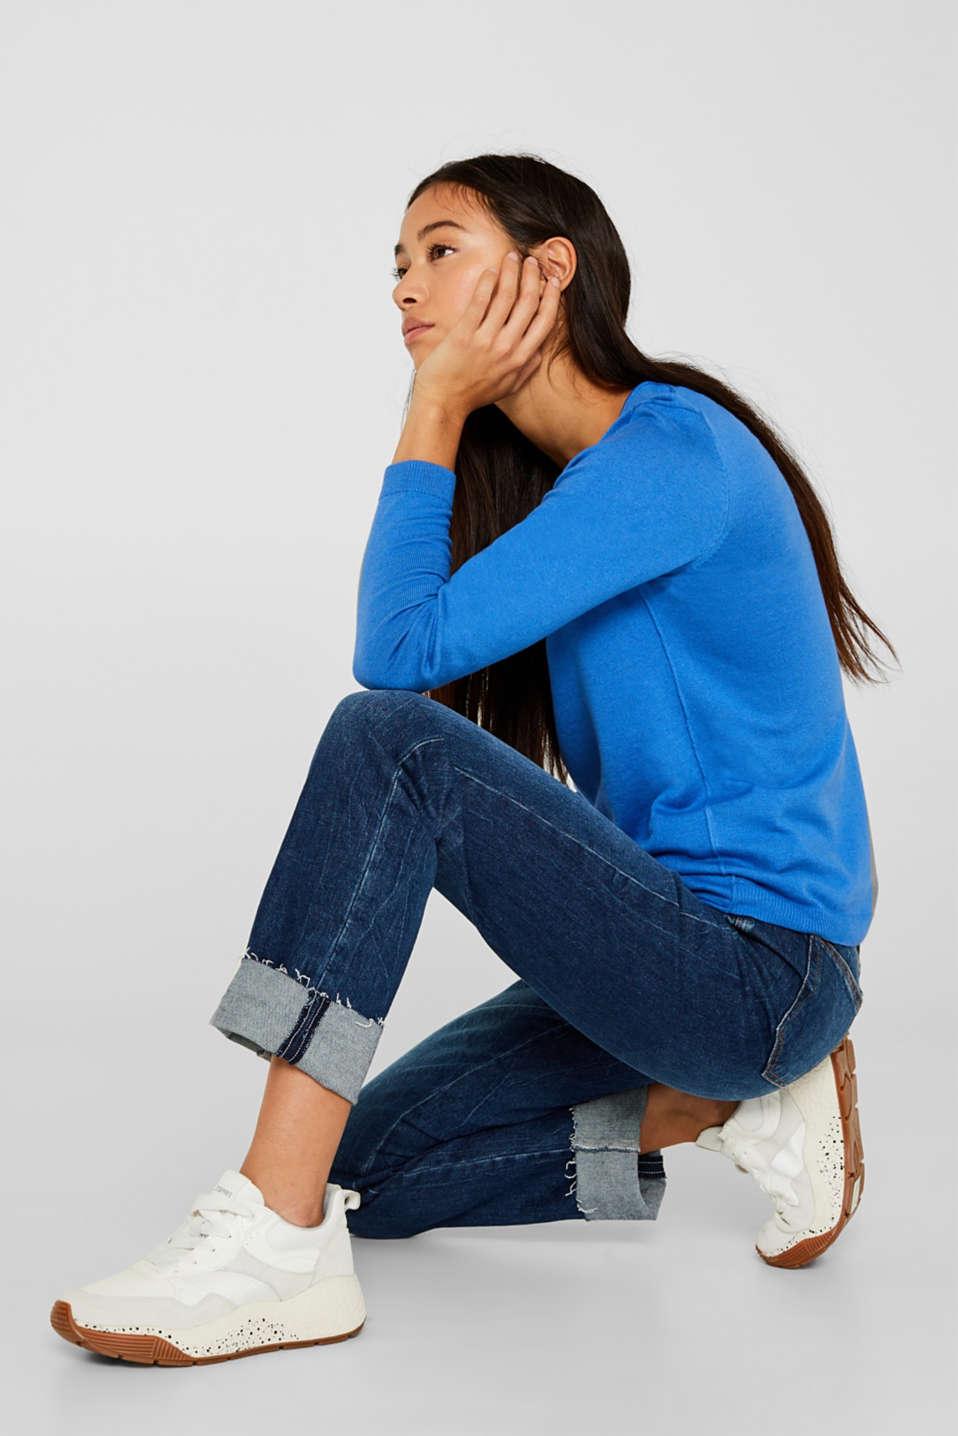 Jumper, organic cotton, BRIGHT BLUE, detail image number 5